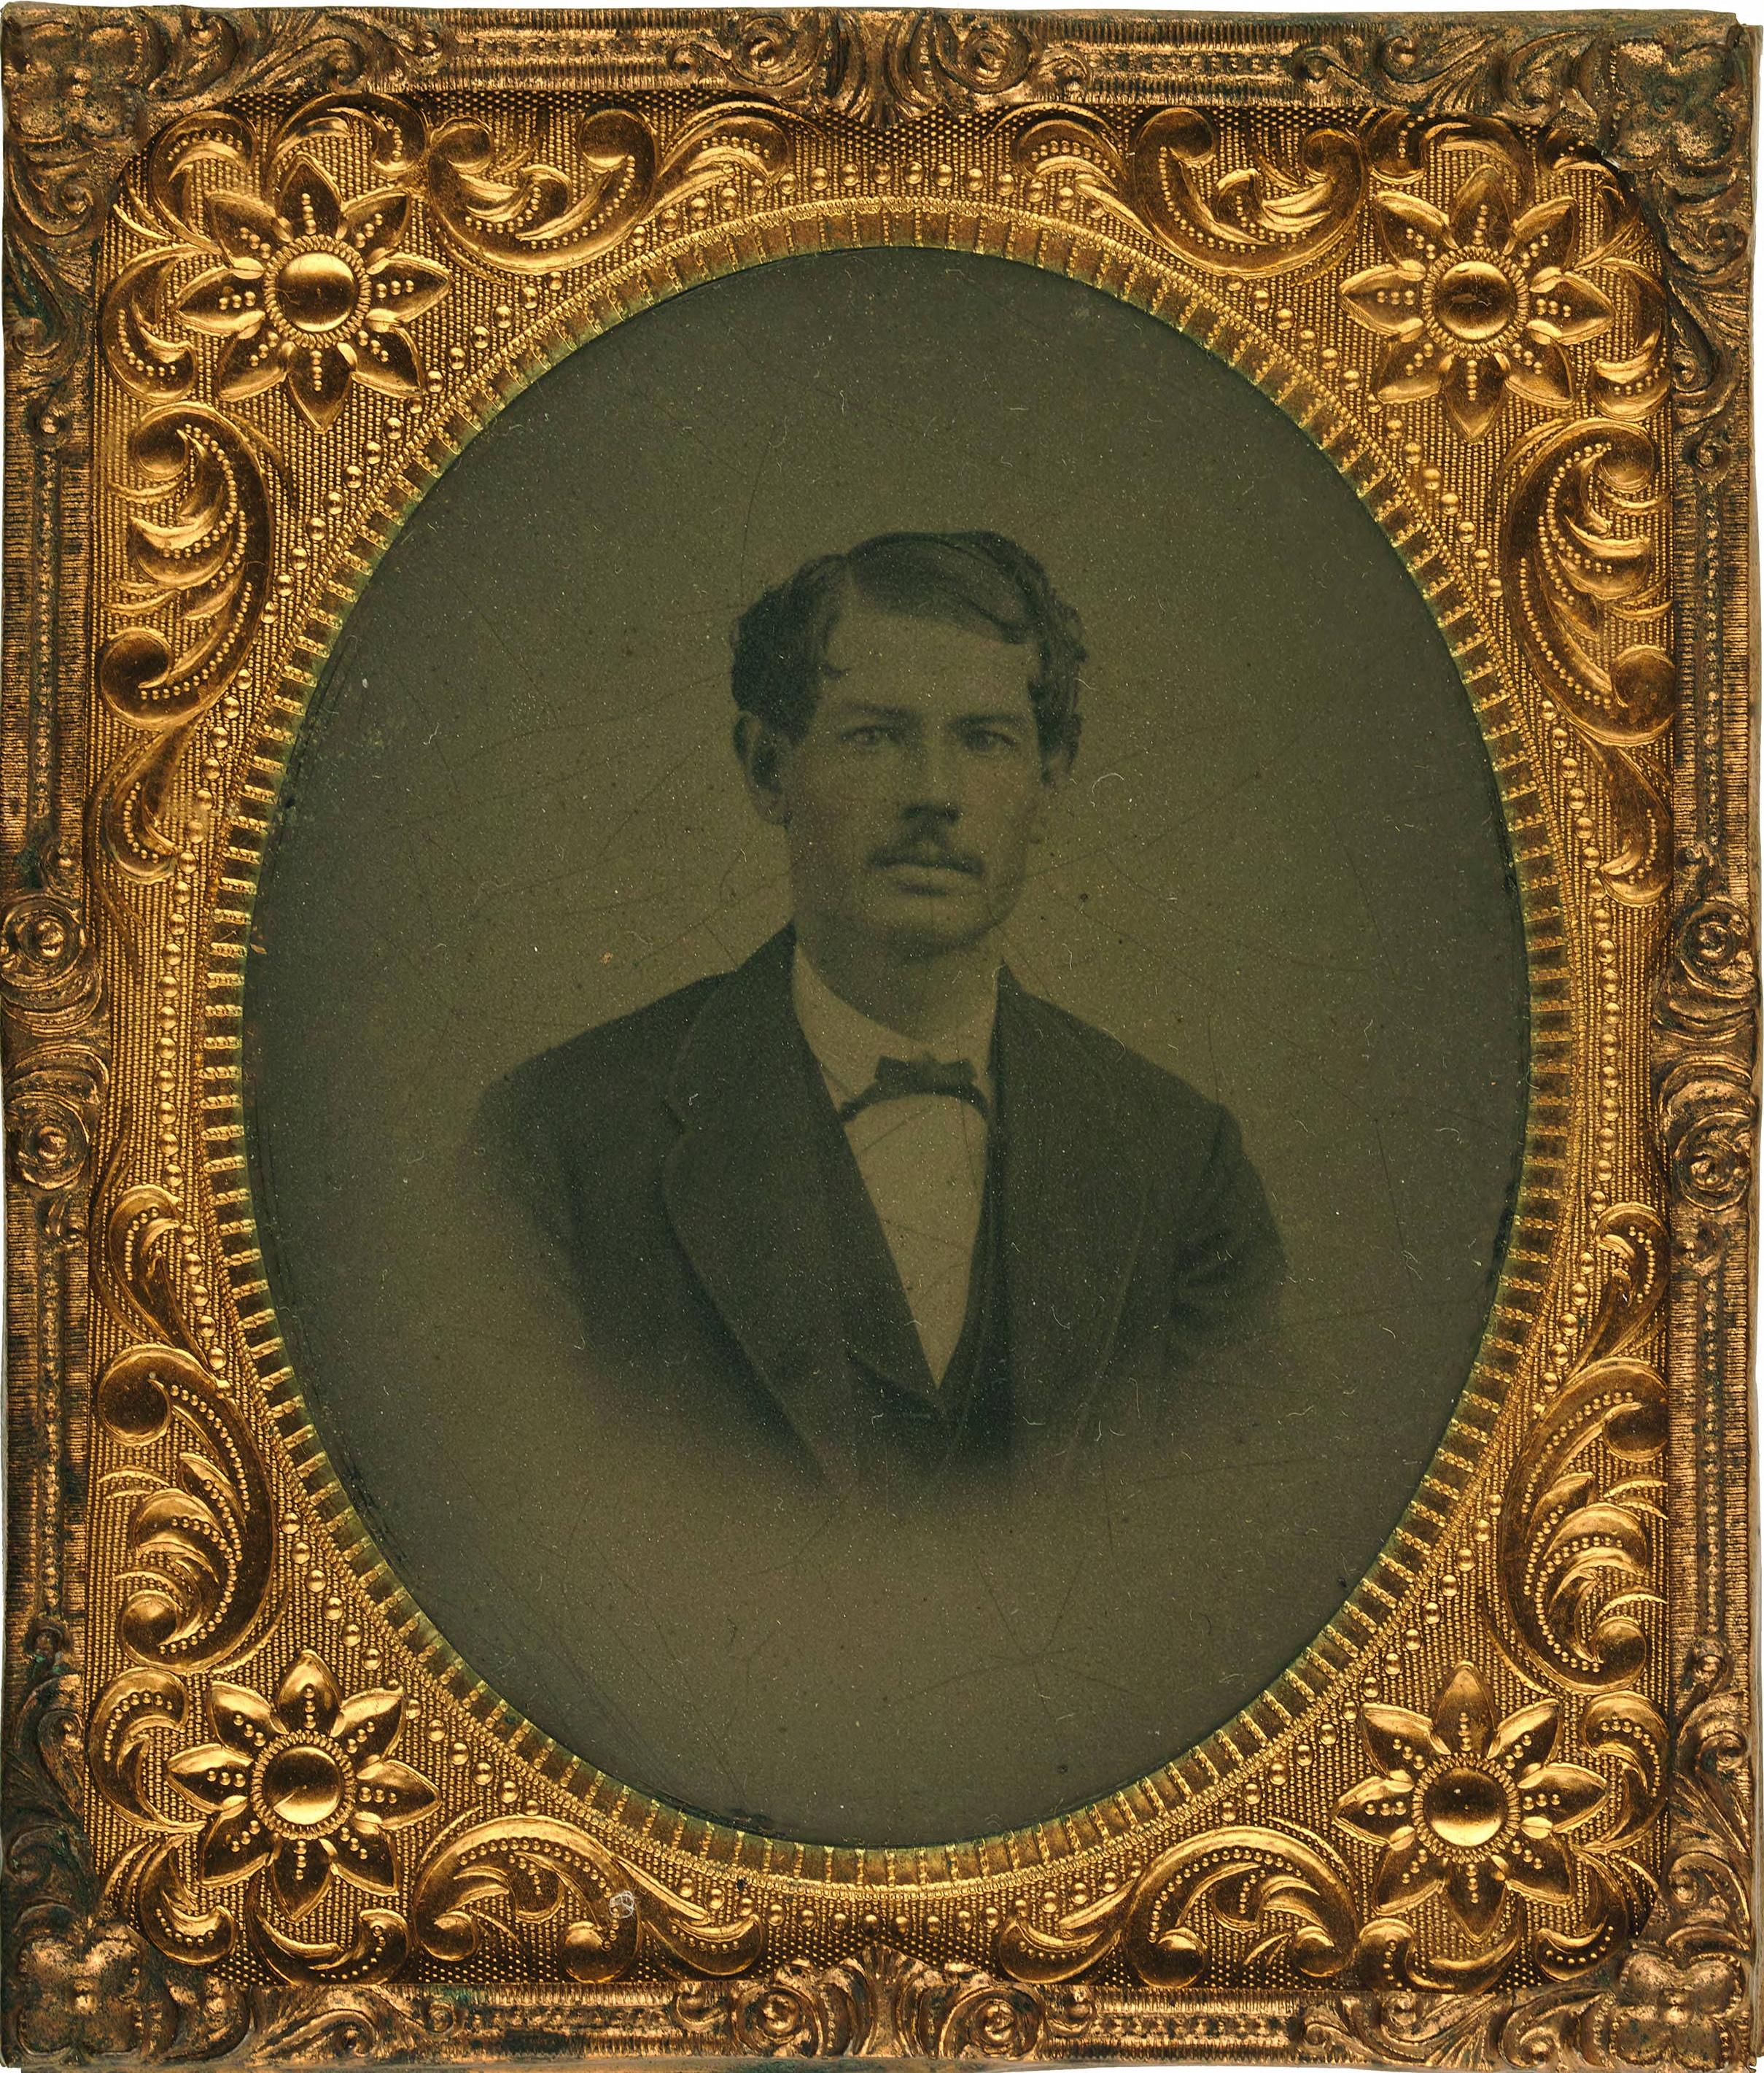 Image of William J. Oliphant from Wikidata